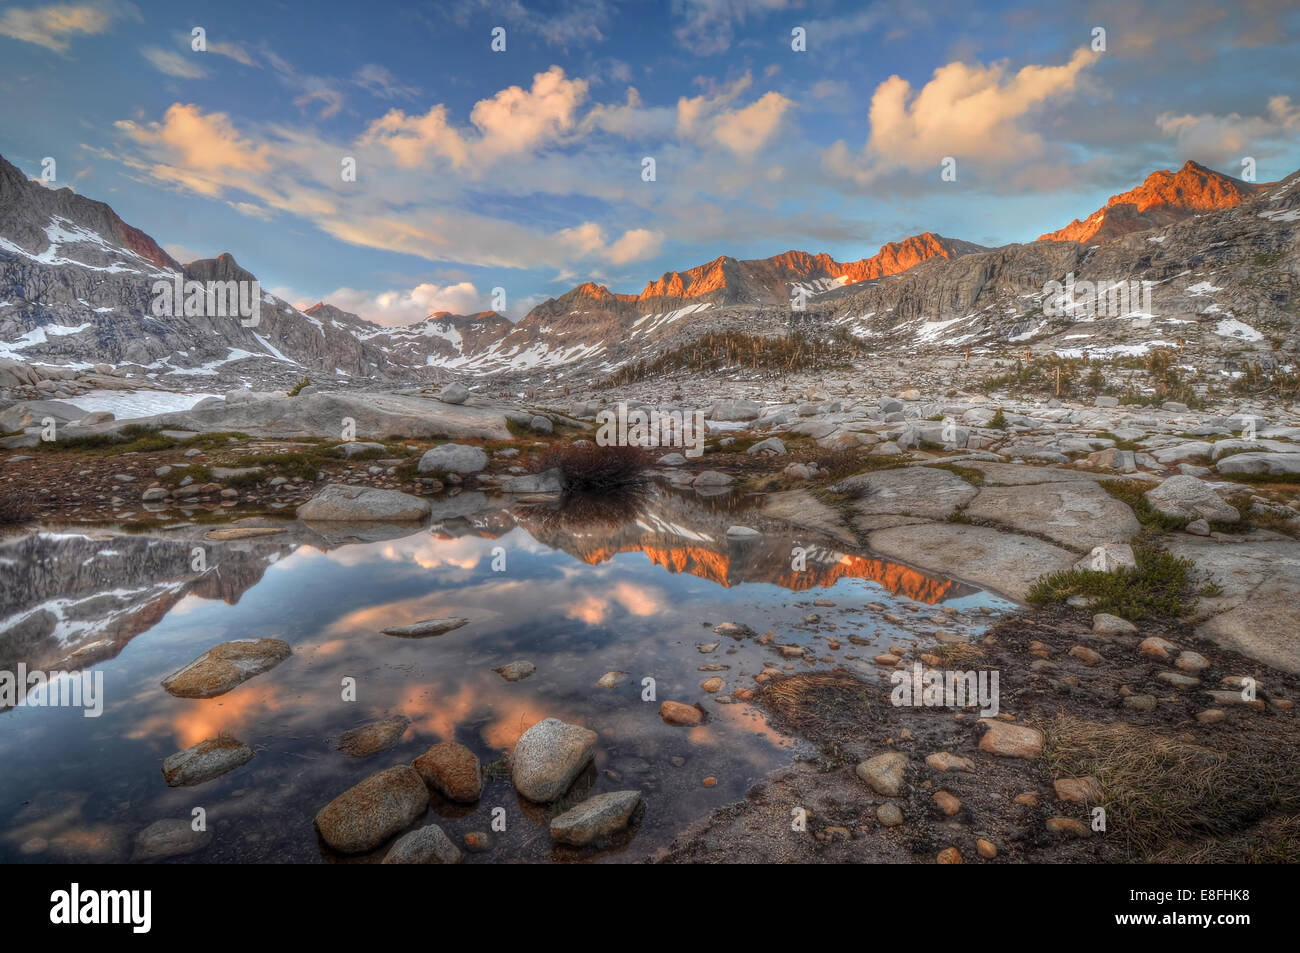 USA, California, Sequoia National Park, Sunset over Nine Lake basin - Stock Image